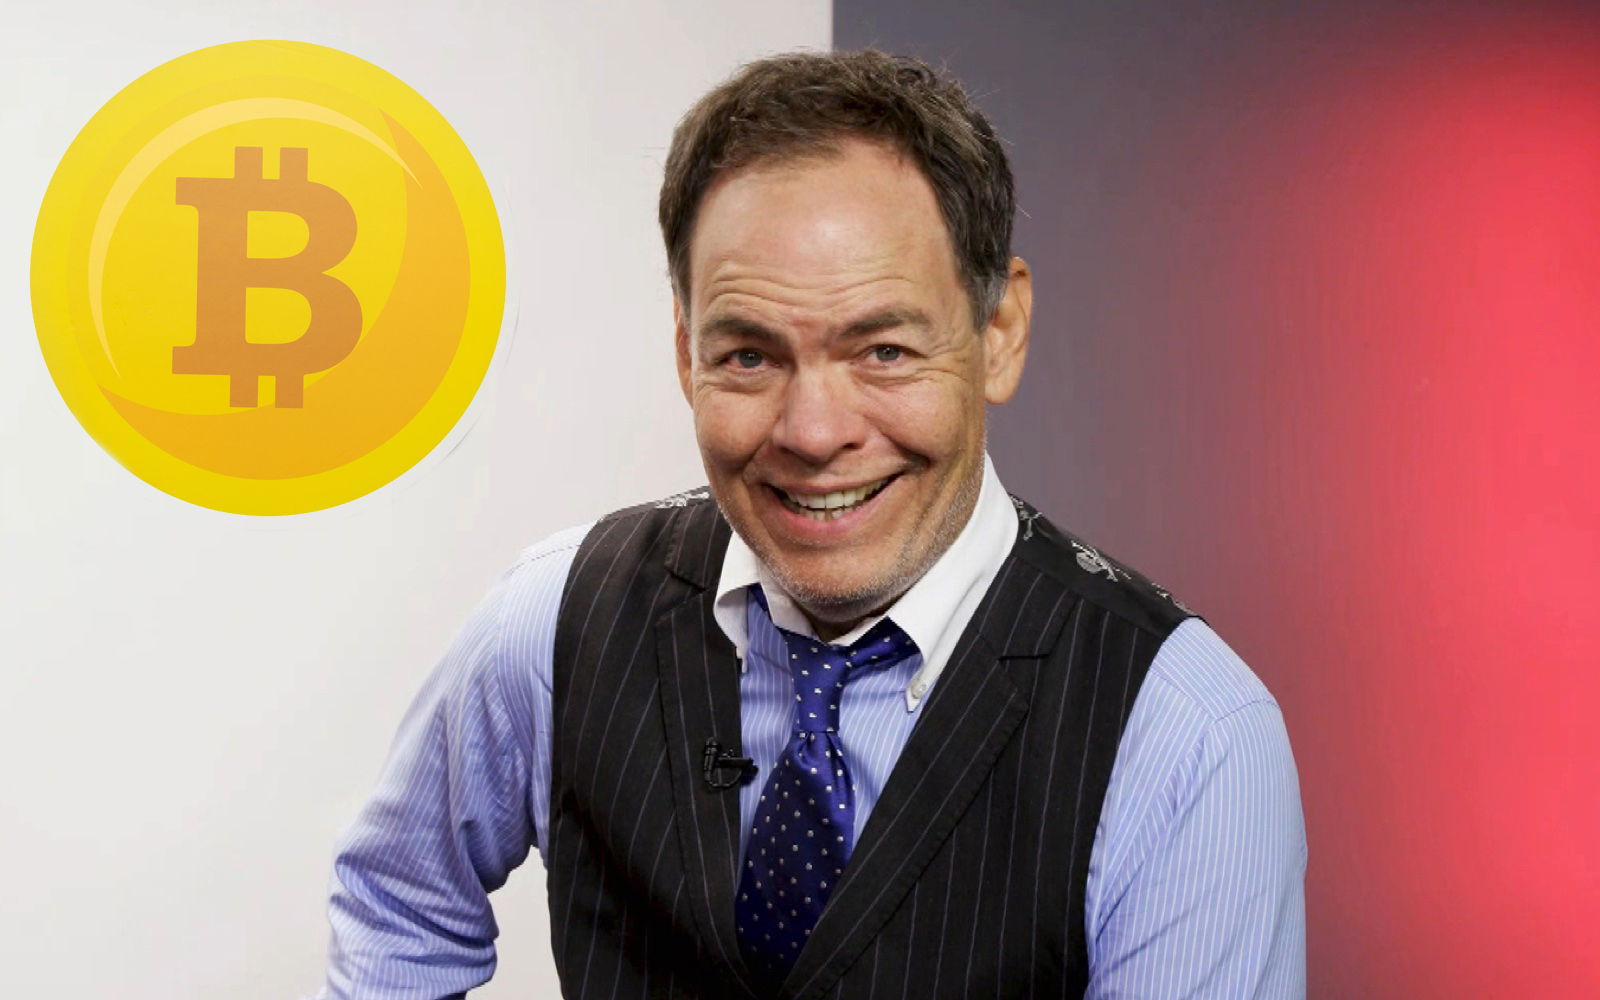 max keiser bitcoin aciklamasinda bulundu